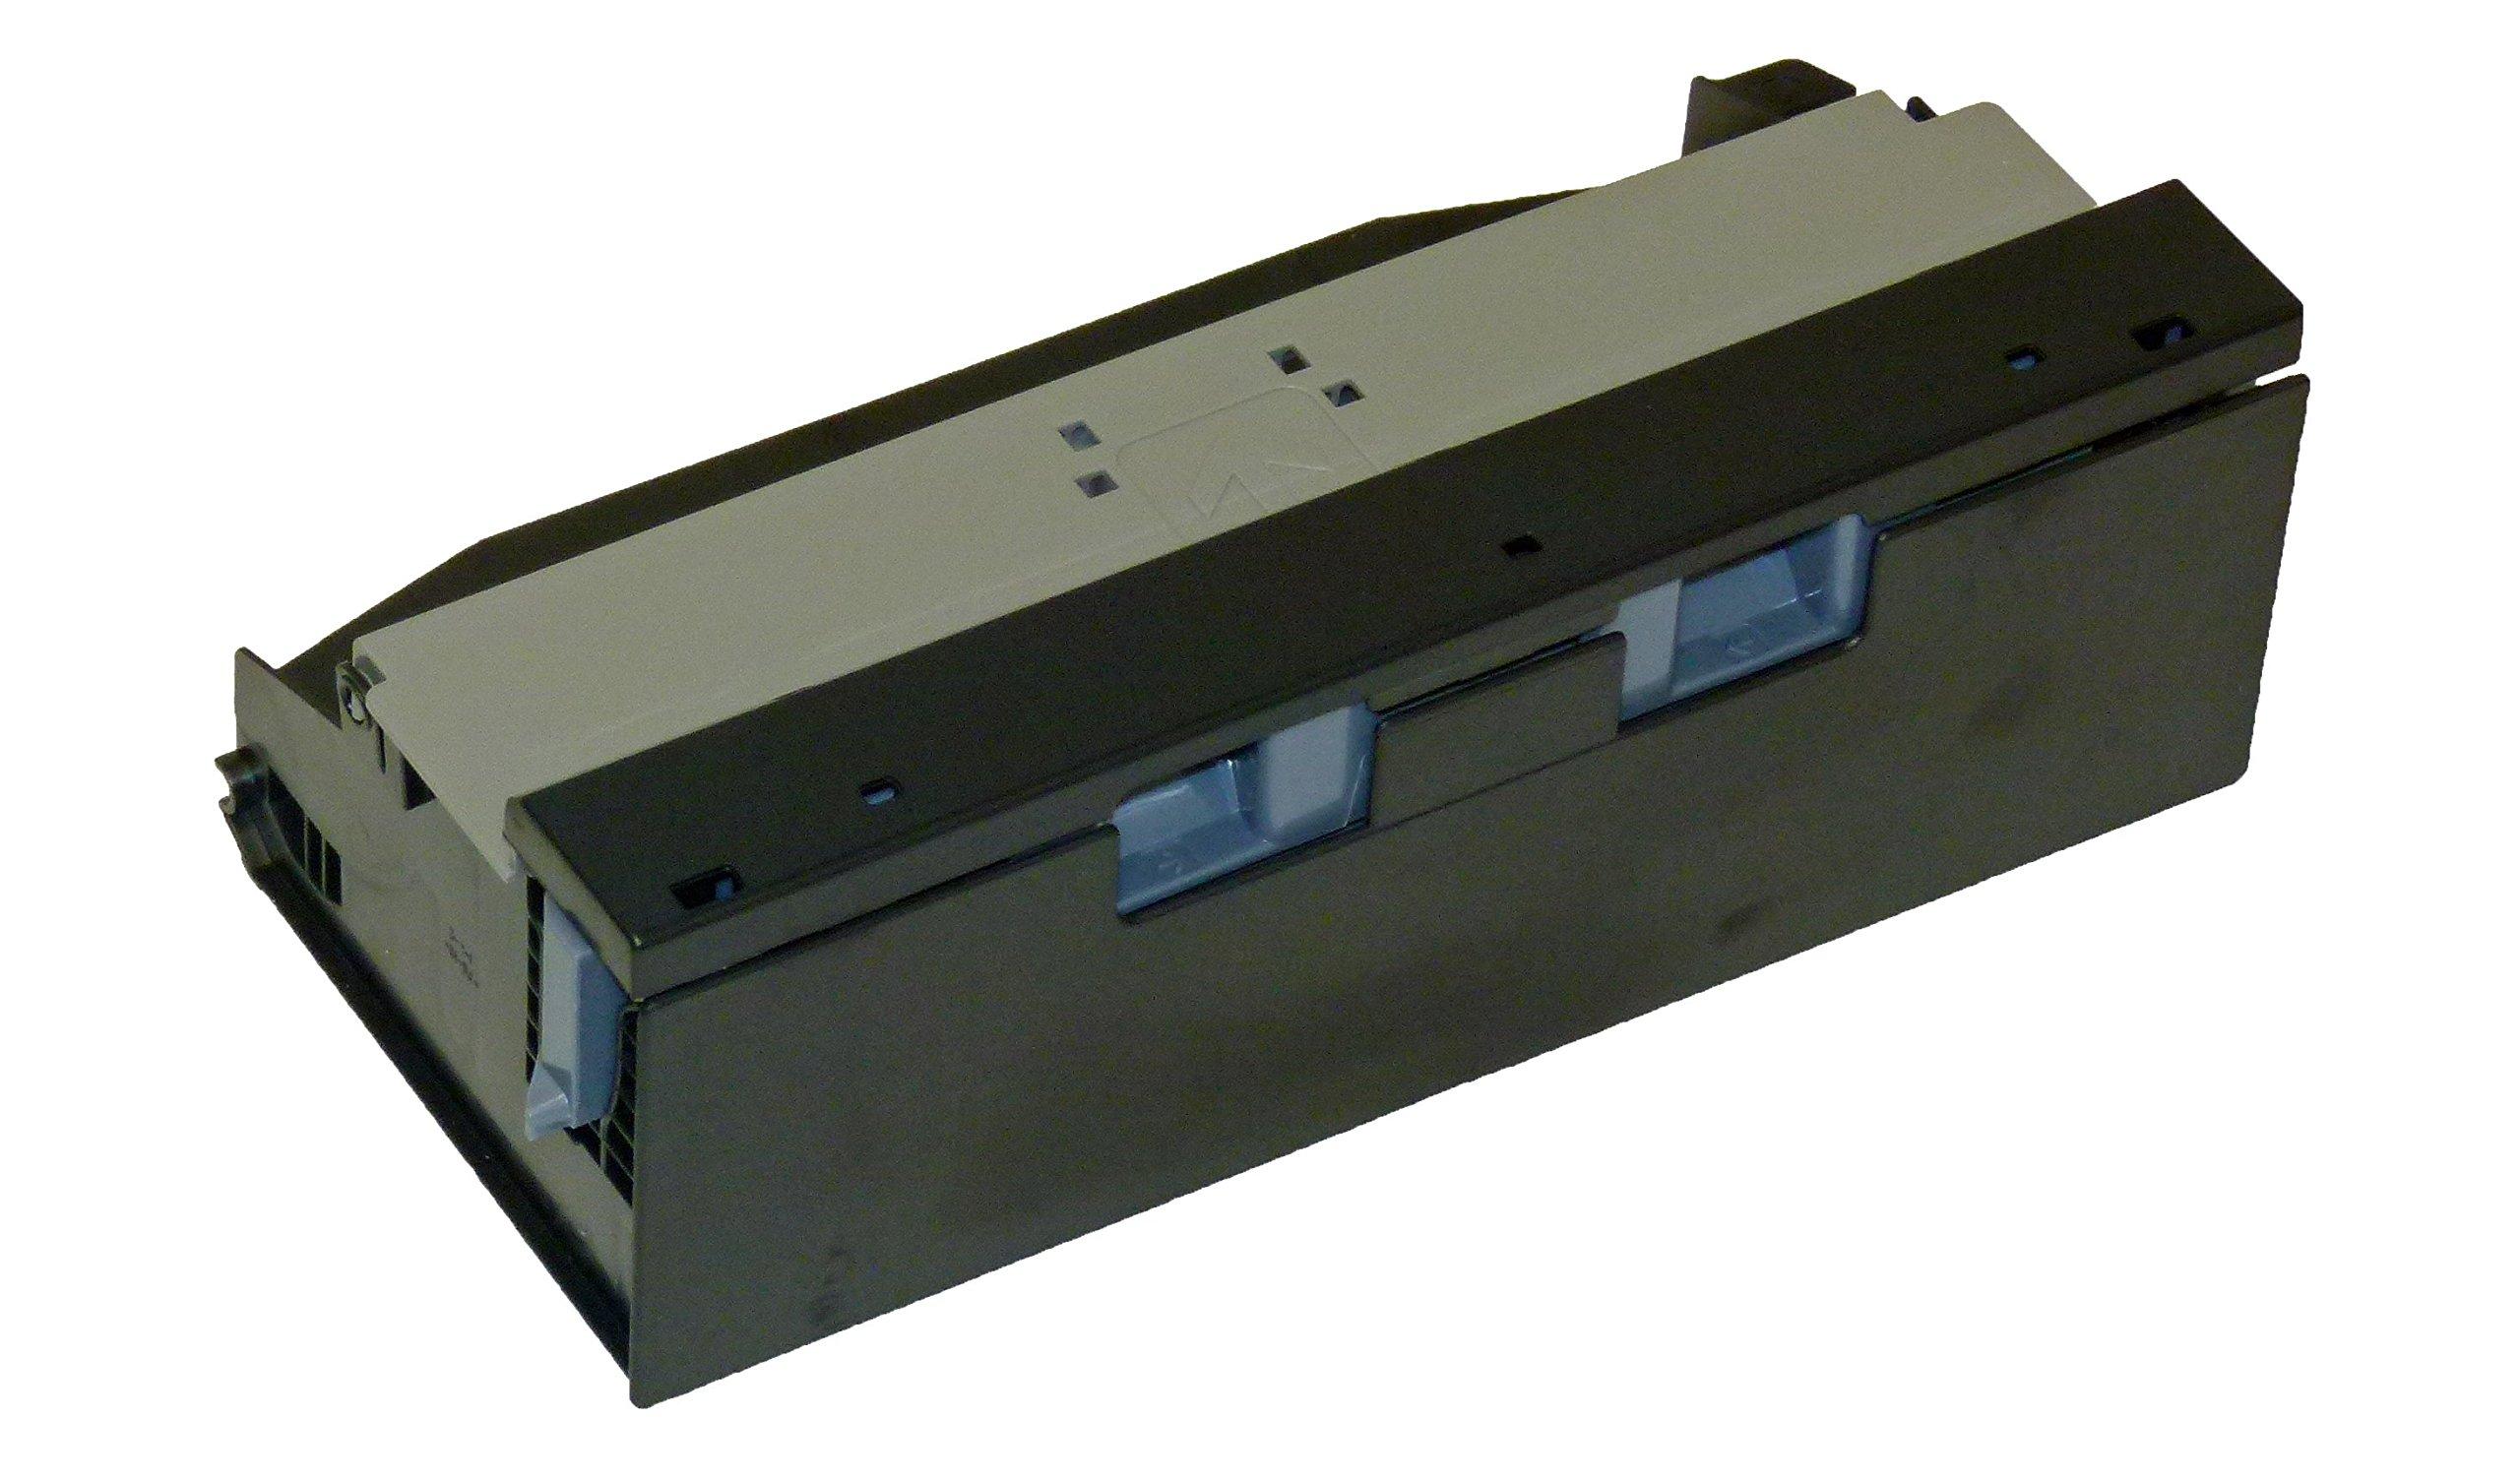 OEM Epson Duplex / Duplexer Assembly For: EcoTank ET-4550, WorkForce WF-2650, WF-2651, WF-2660, WF-2661